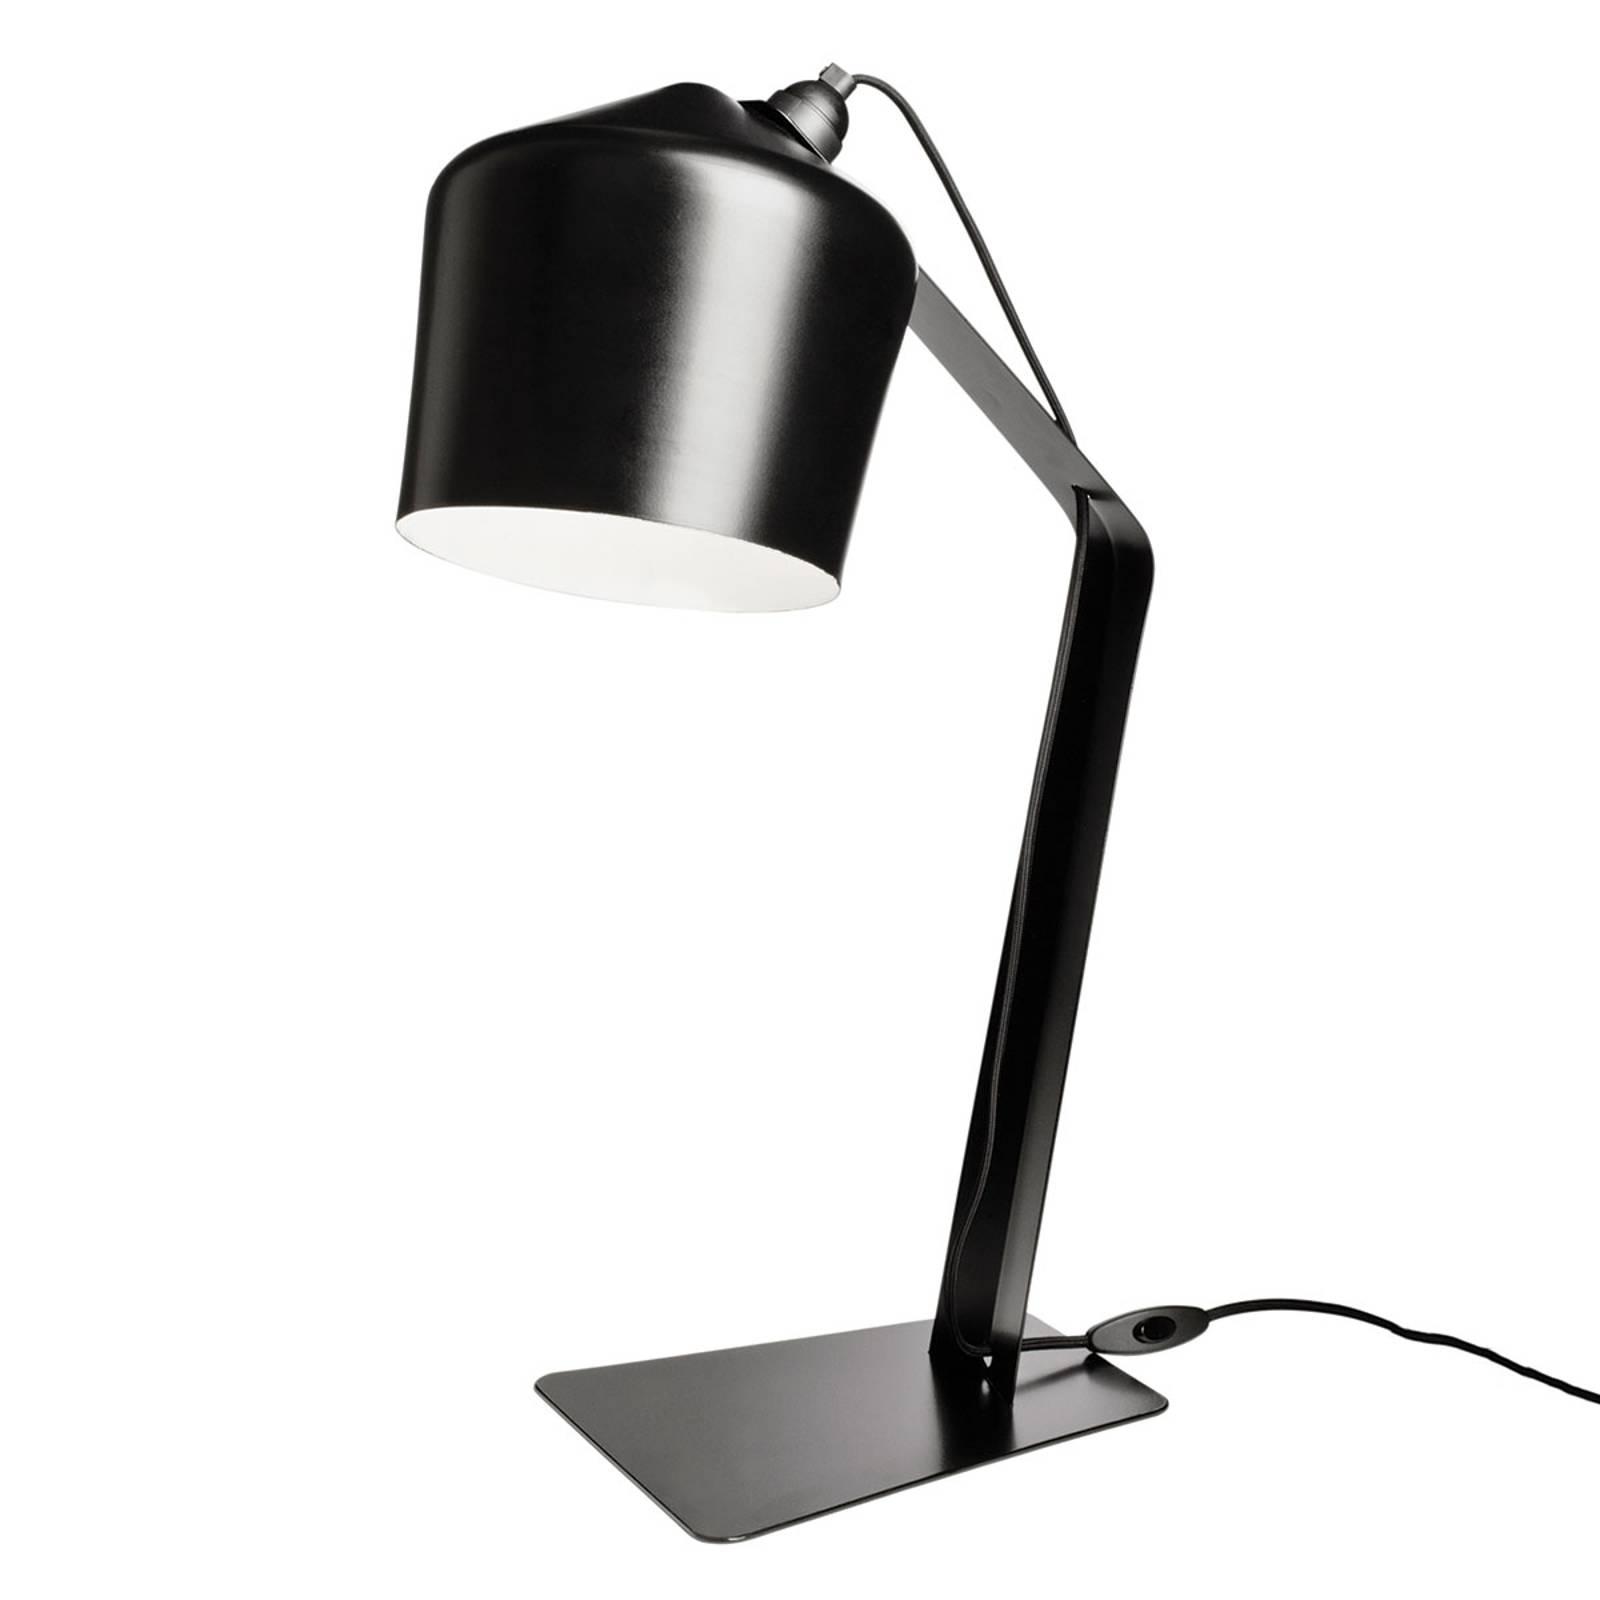 Innolux Pasila lampe à poser design noir